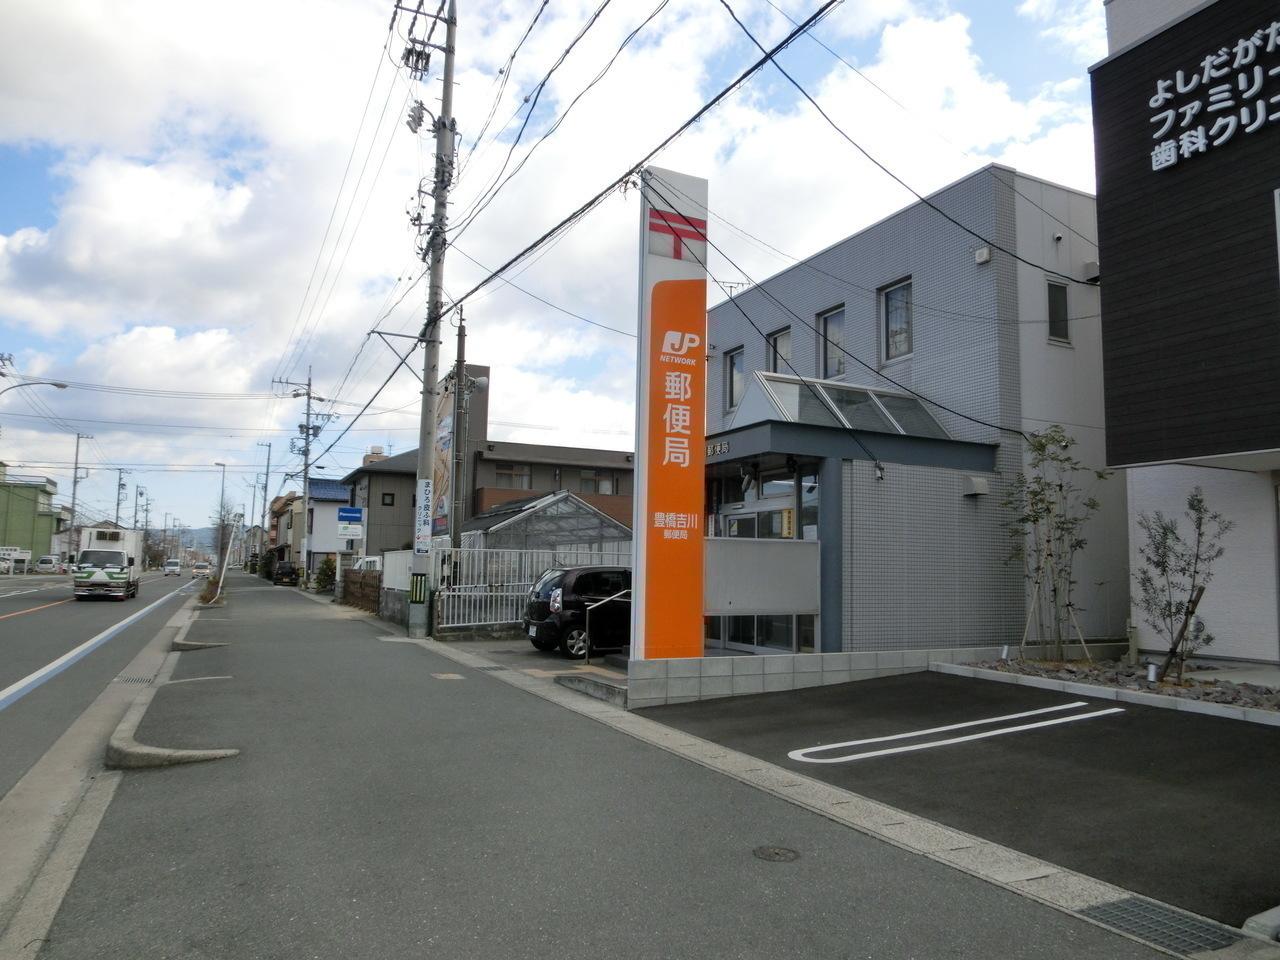 【郵便局】豊橋吉川郵便局まで徒歩8分(587m)